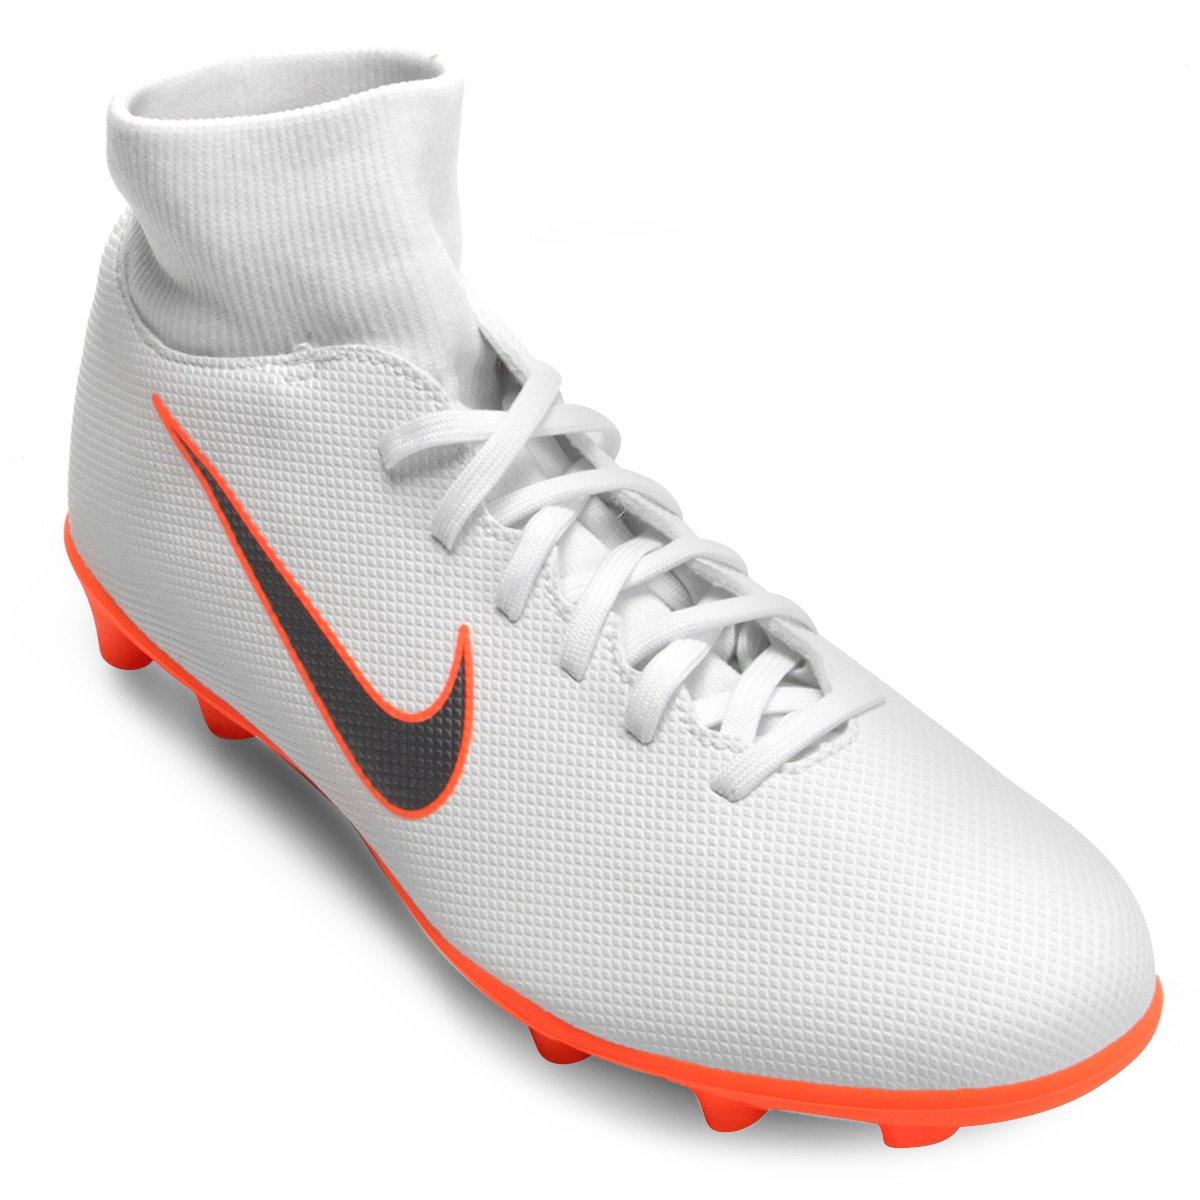 ddbcc17bd6904 Chuteira Campo Nike Mercurial Superfly 6 Club - Branco e Cinza | Loja do  Inter